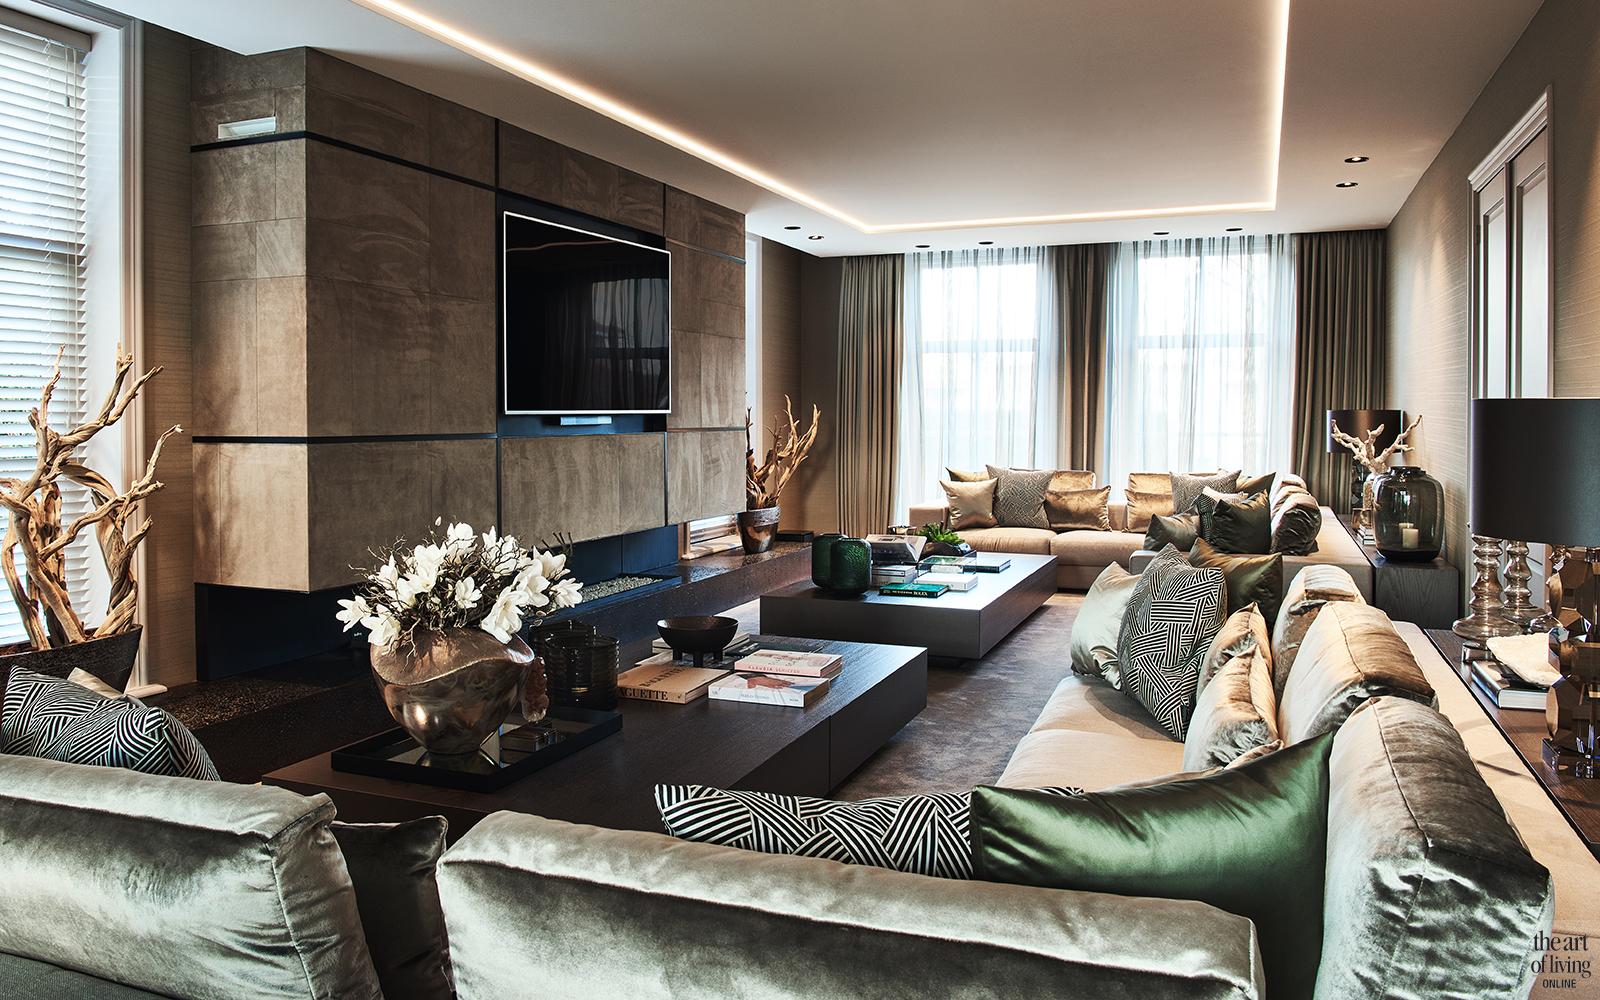 Exclusief interieur, E ric Kuster, Culimaat, Metropolitan Luxury, Interieur, details, luxury, Bloemen, luxueus interieur, woonkamer, living, lounge